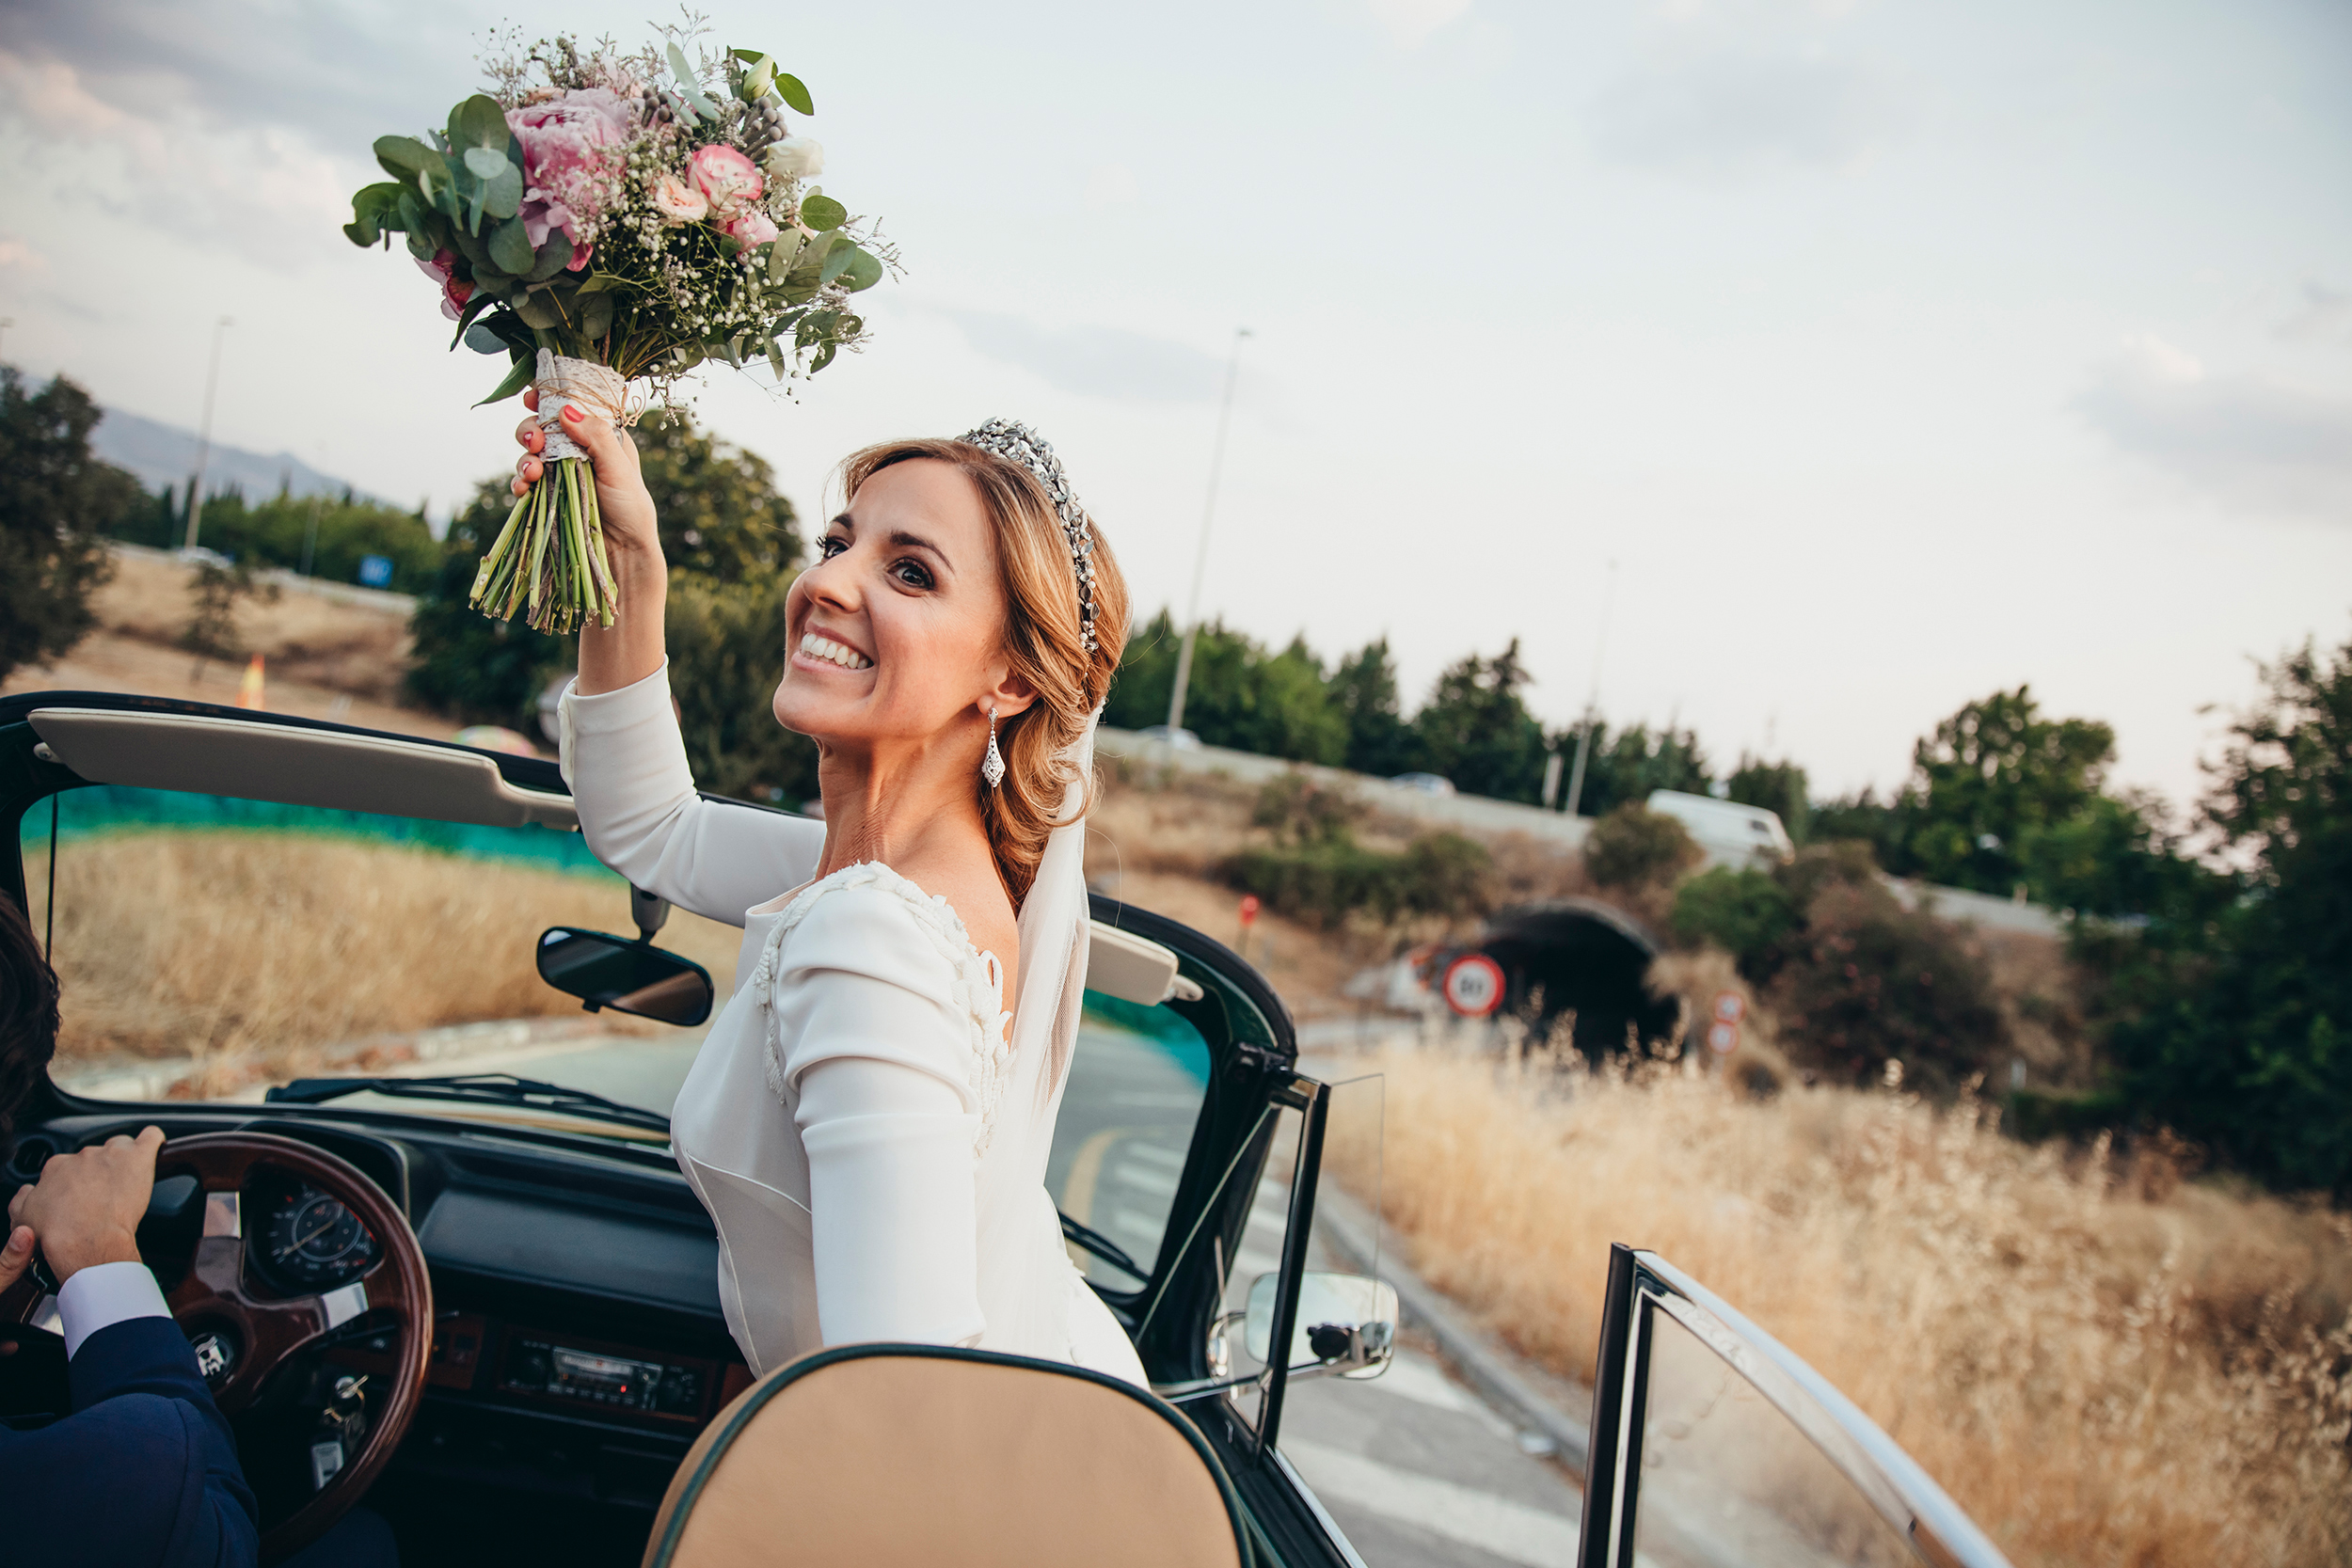 fotografo-bodas-granada-catedral-sagrario-jose-reyes_060.jpg